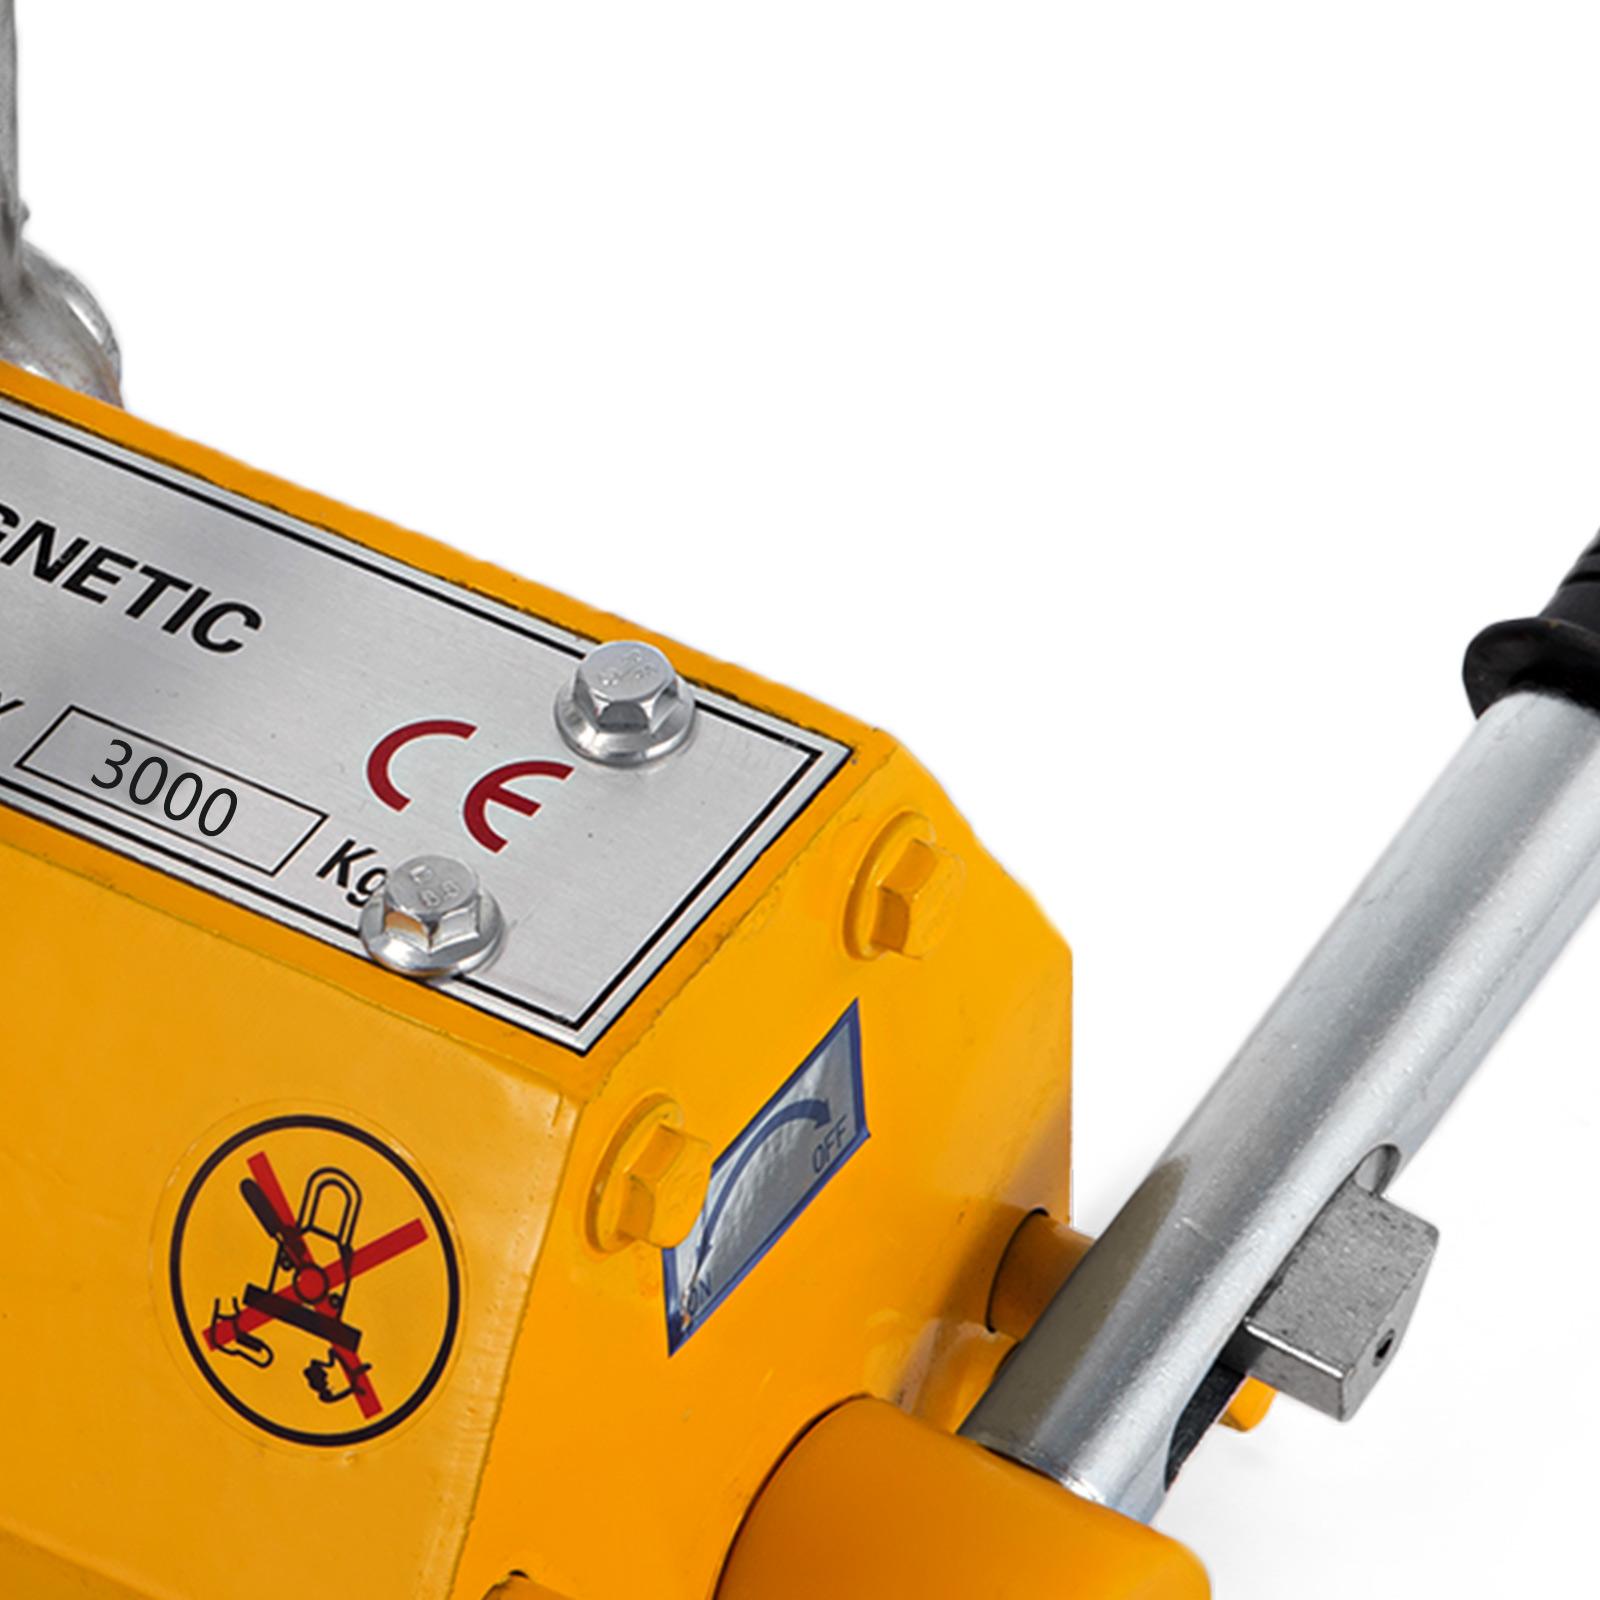 100-300-600-1000KG-Steel-Magnetic-Lifter-Heavy-Duty-Crane-Hoist-Lifting-Magnet miniature 106